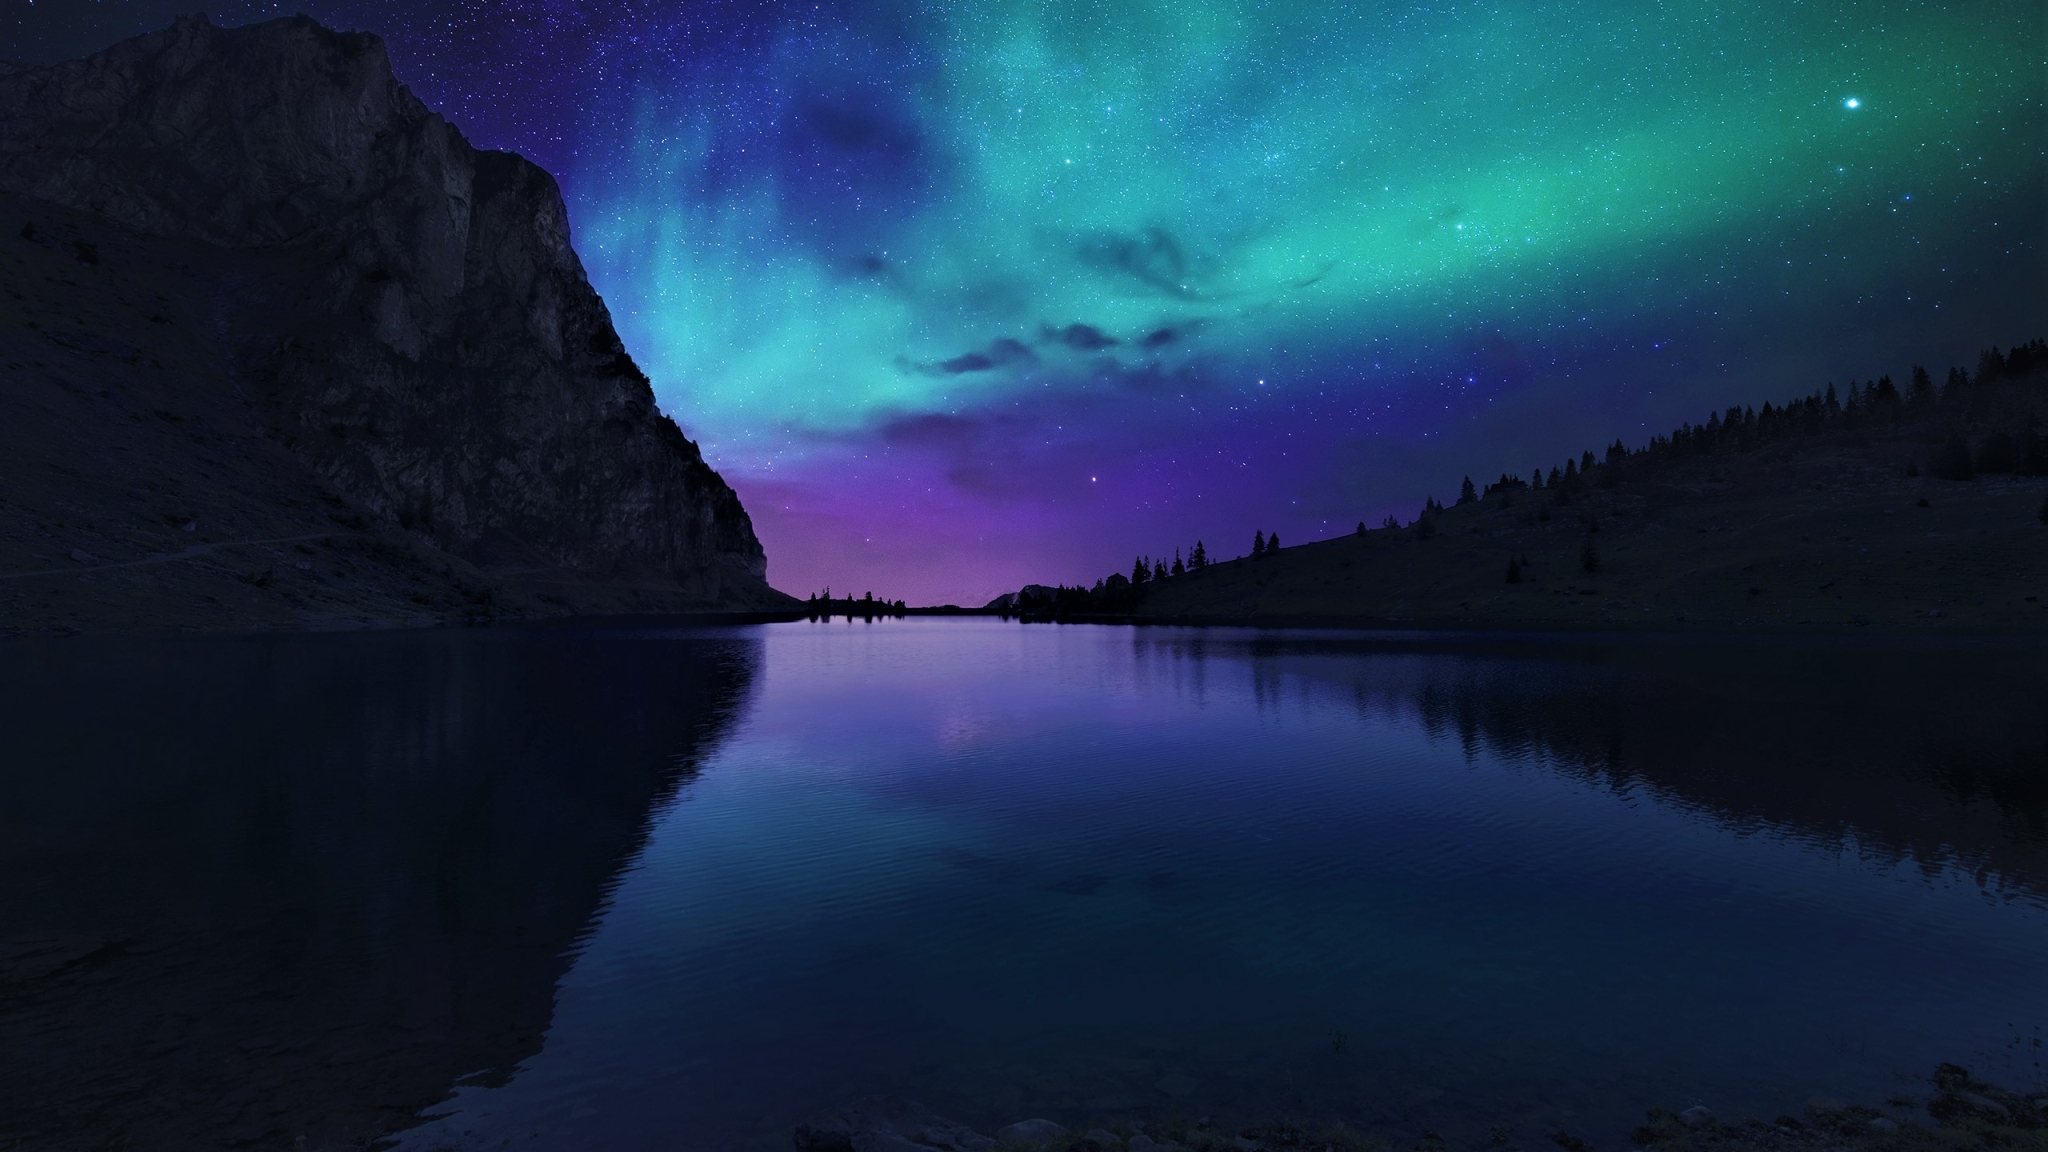 Aurora Borealis Northern Lights Over Mountain Lake Full